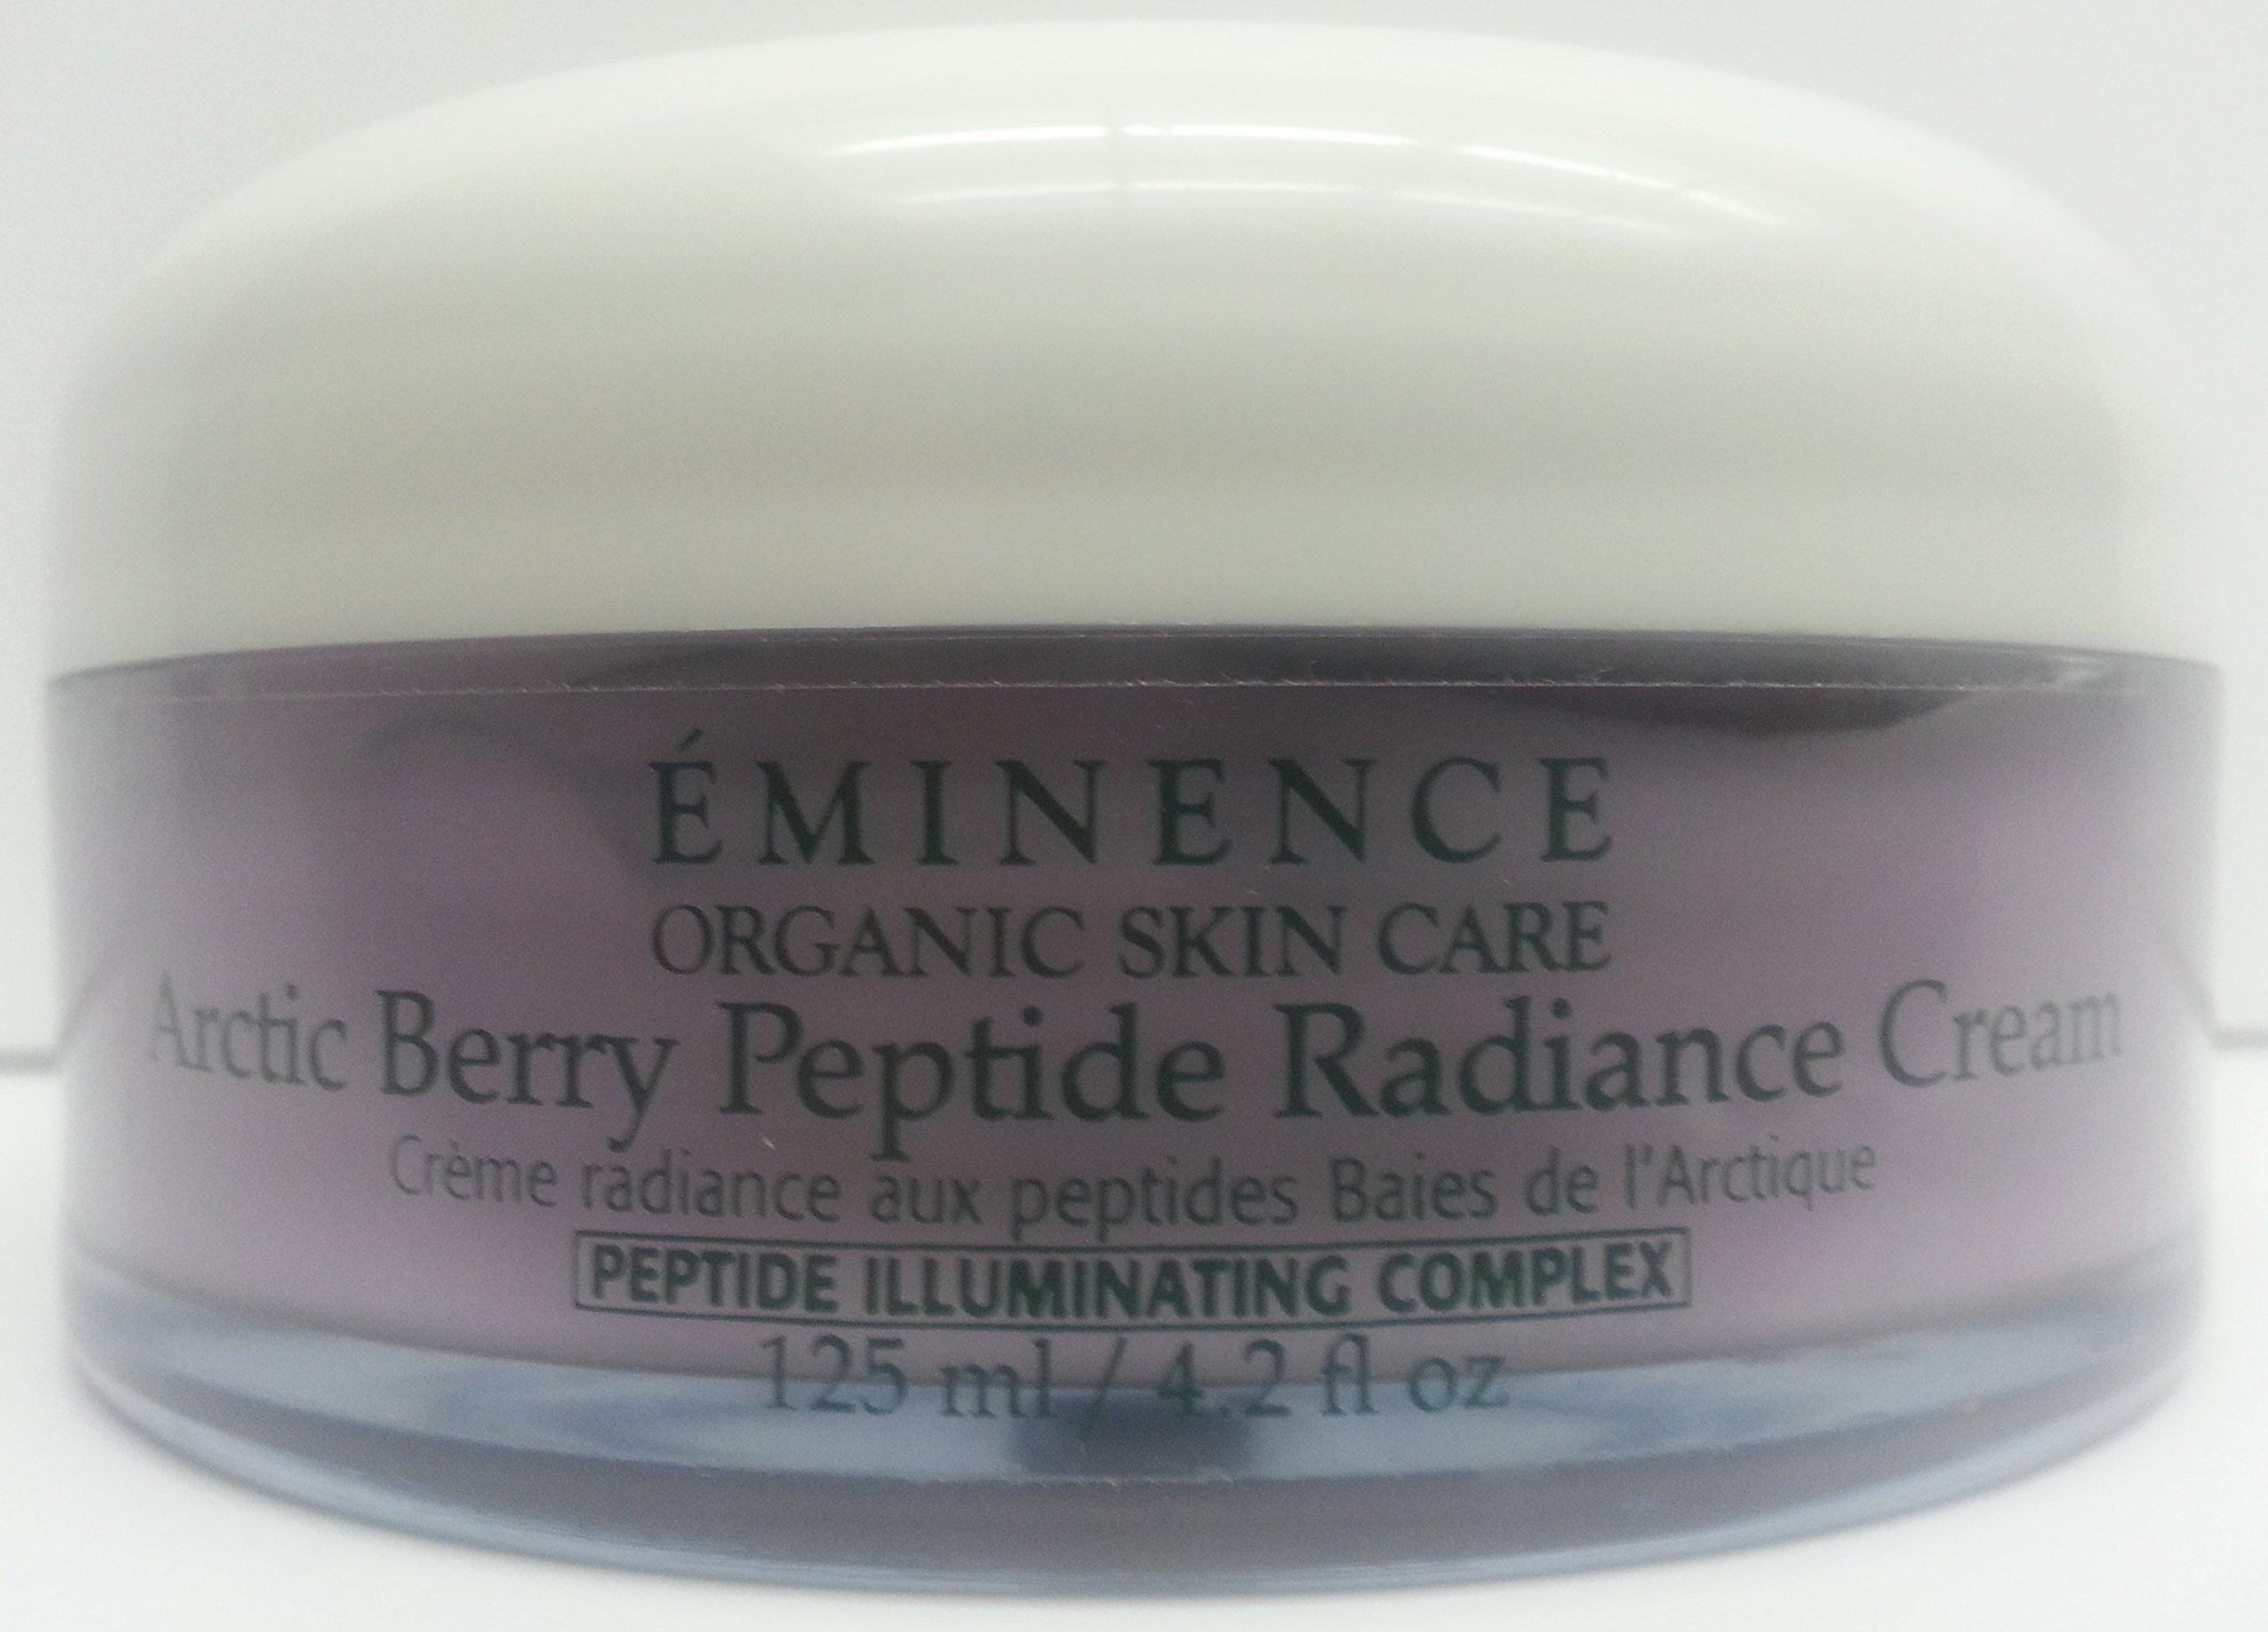 Eminence Arctic Berry Peptide Radiance Cream Professional Size 4.2 oz 125 ml (Huge, 2.2 X BIGGER